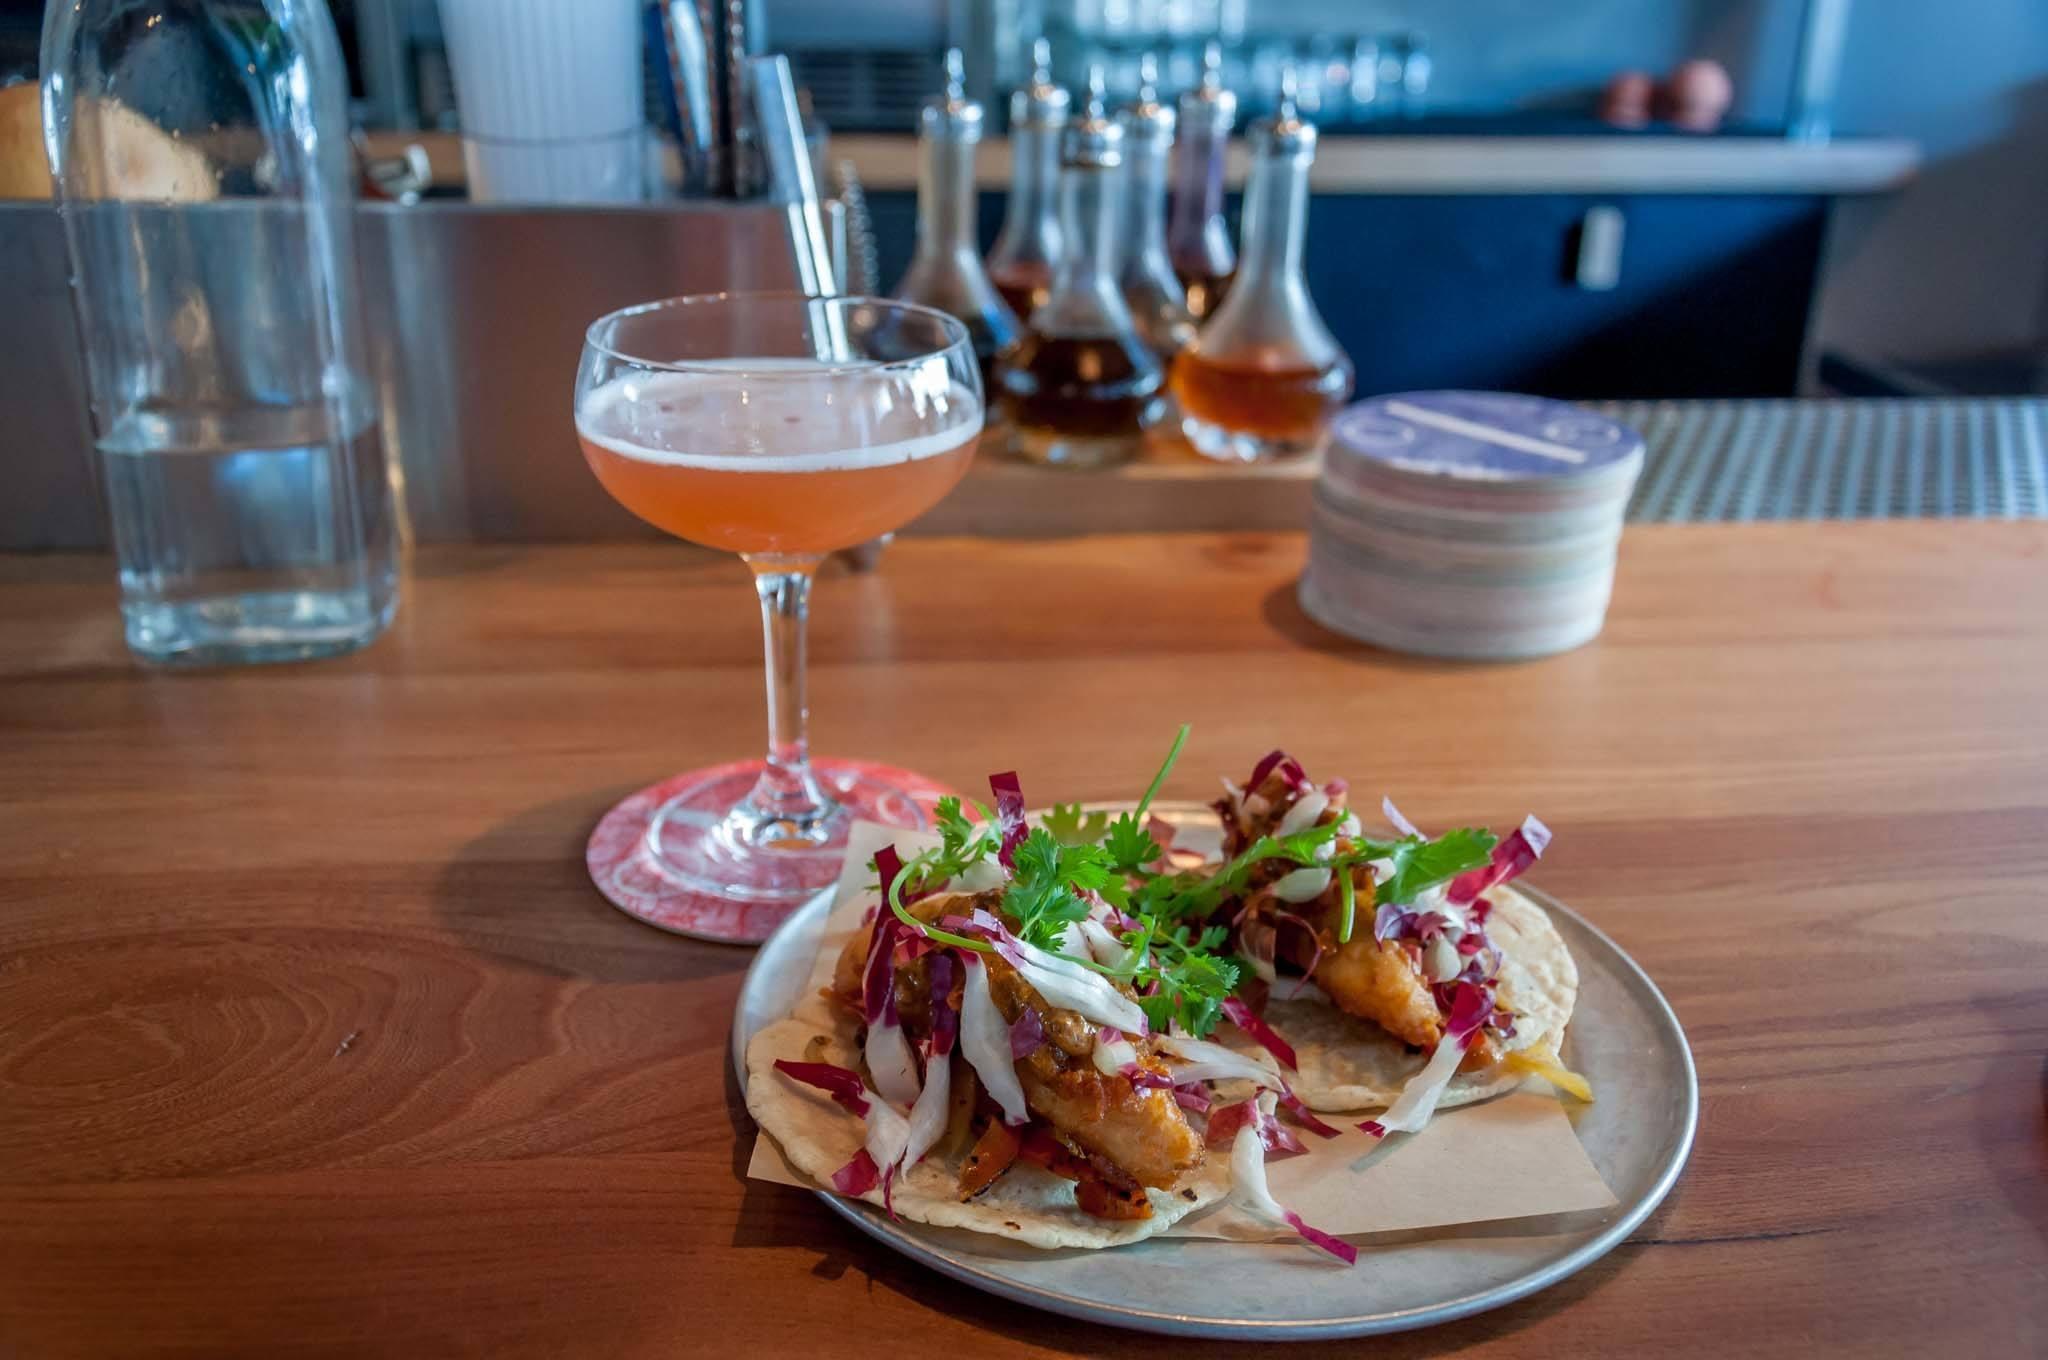 Cocktail and fish tacos at ABV